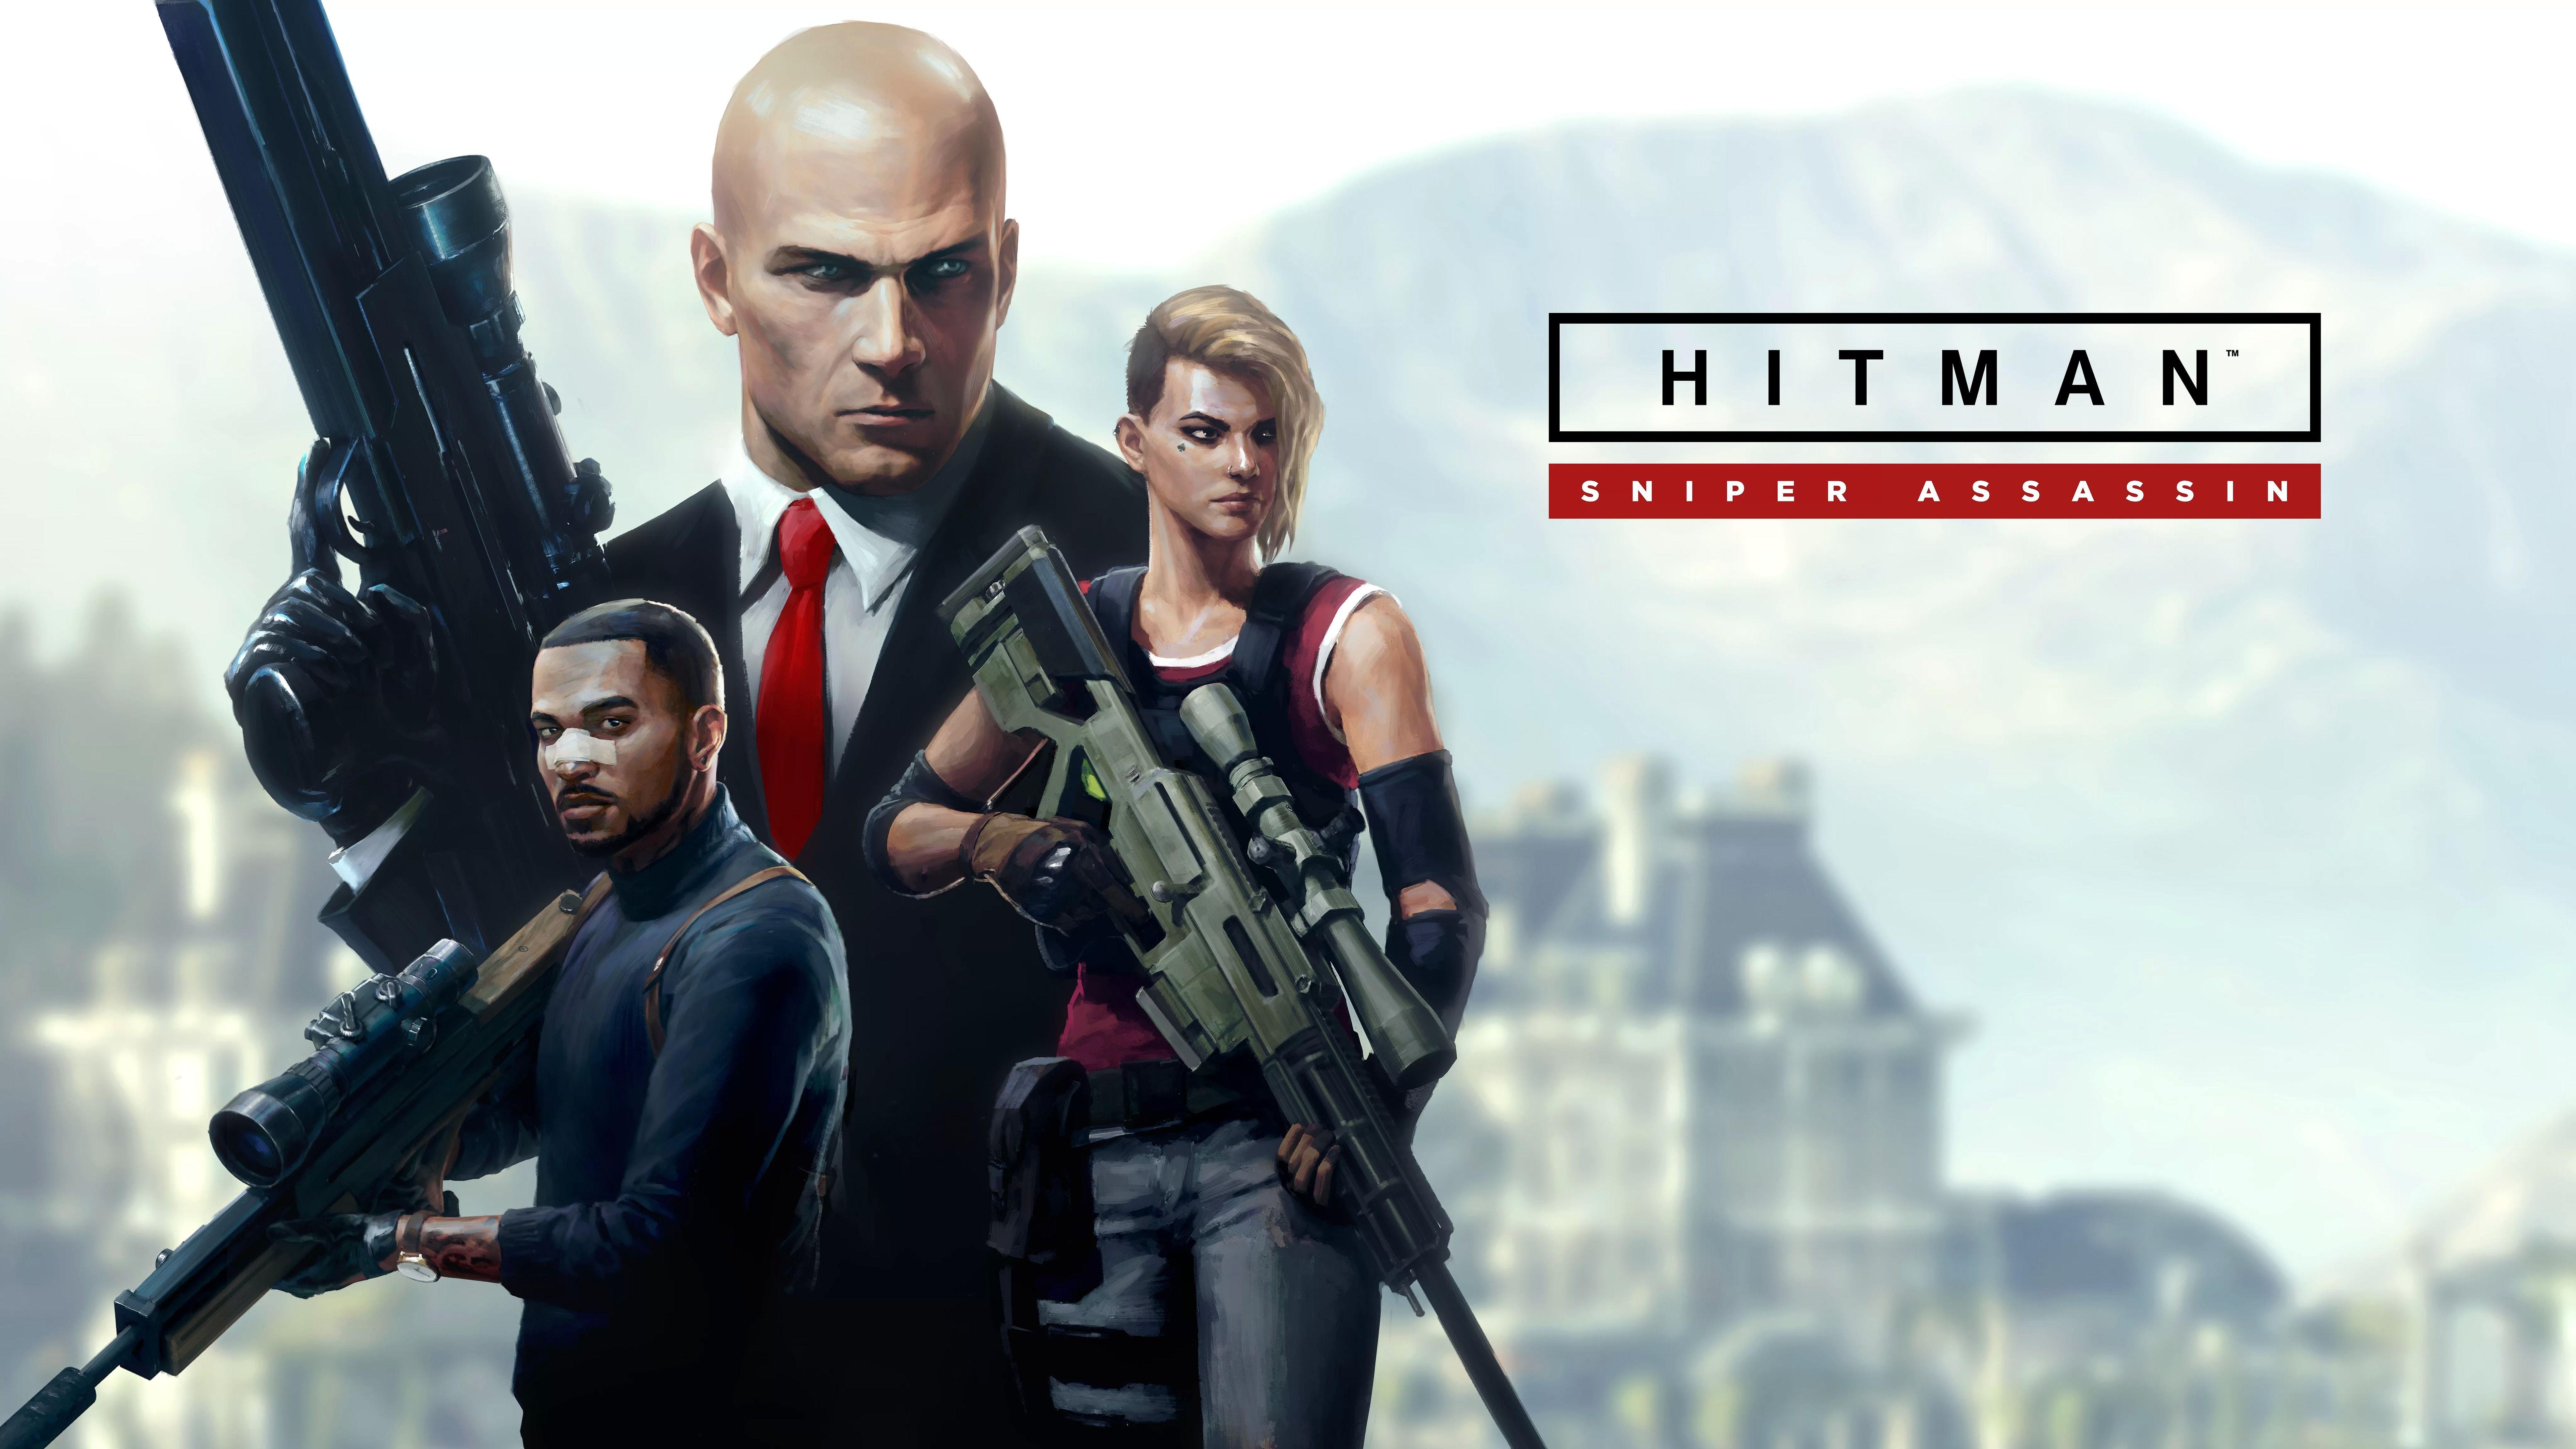 Hitman 2 Sniper Assassin 8k Games 2018 Games Wallpapers 4k Wallpapers 5k Wallpapers 8k Wallpapers Games Wallpapers Hd Wallpapers Hitman 2 Wallpapers Hi